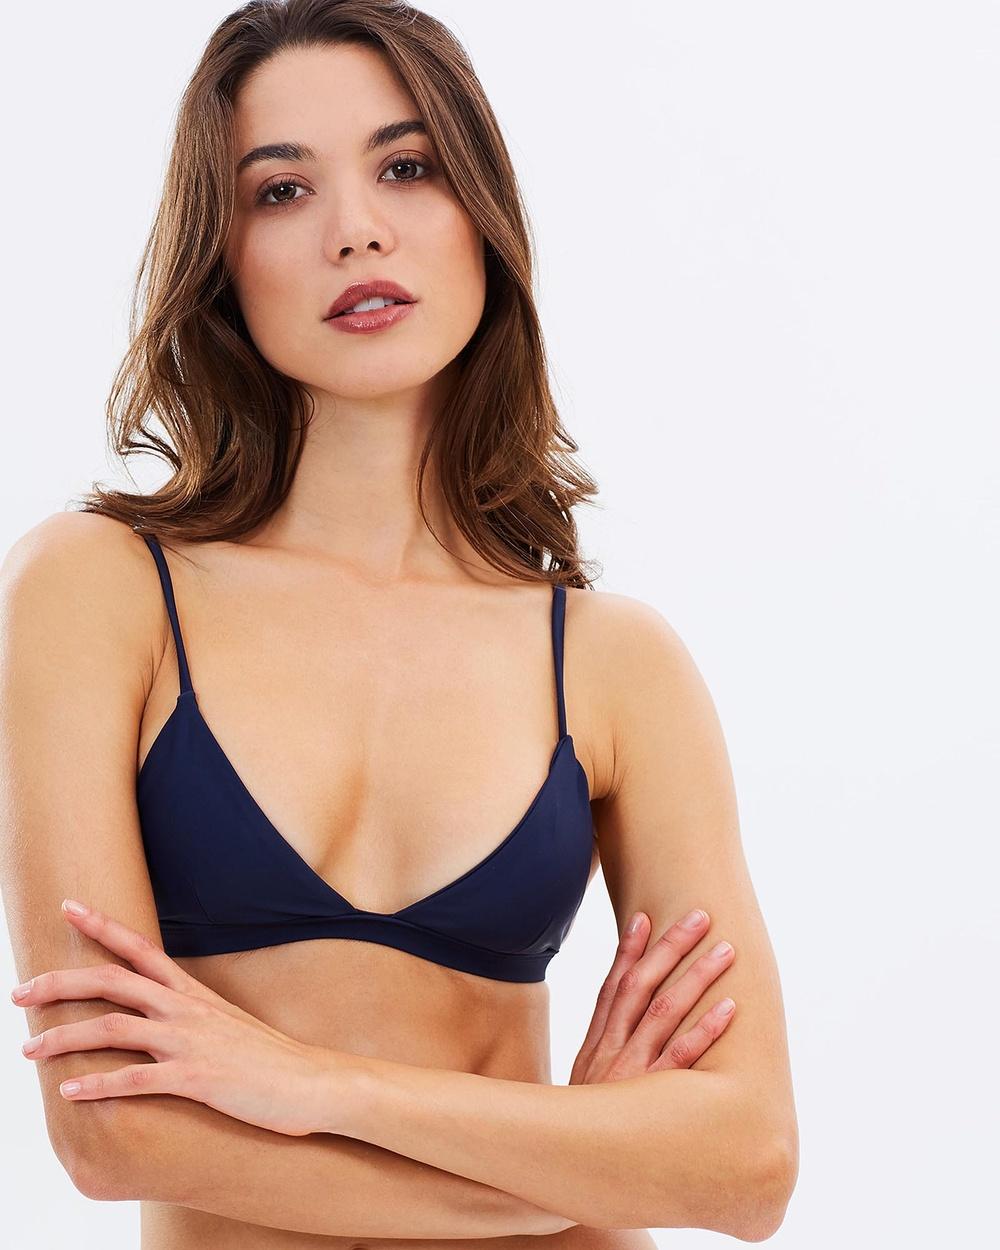 Tanliines The Dawn Top Bikini Tops Navy The Dawn Top